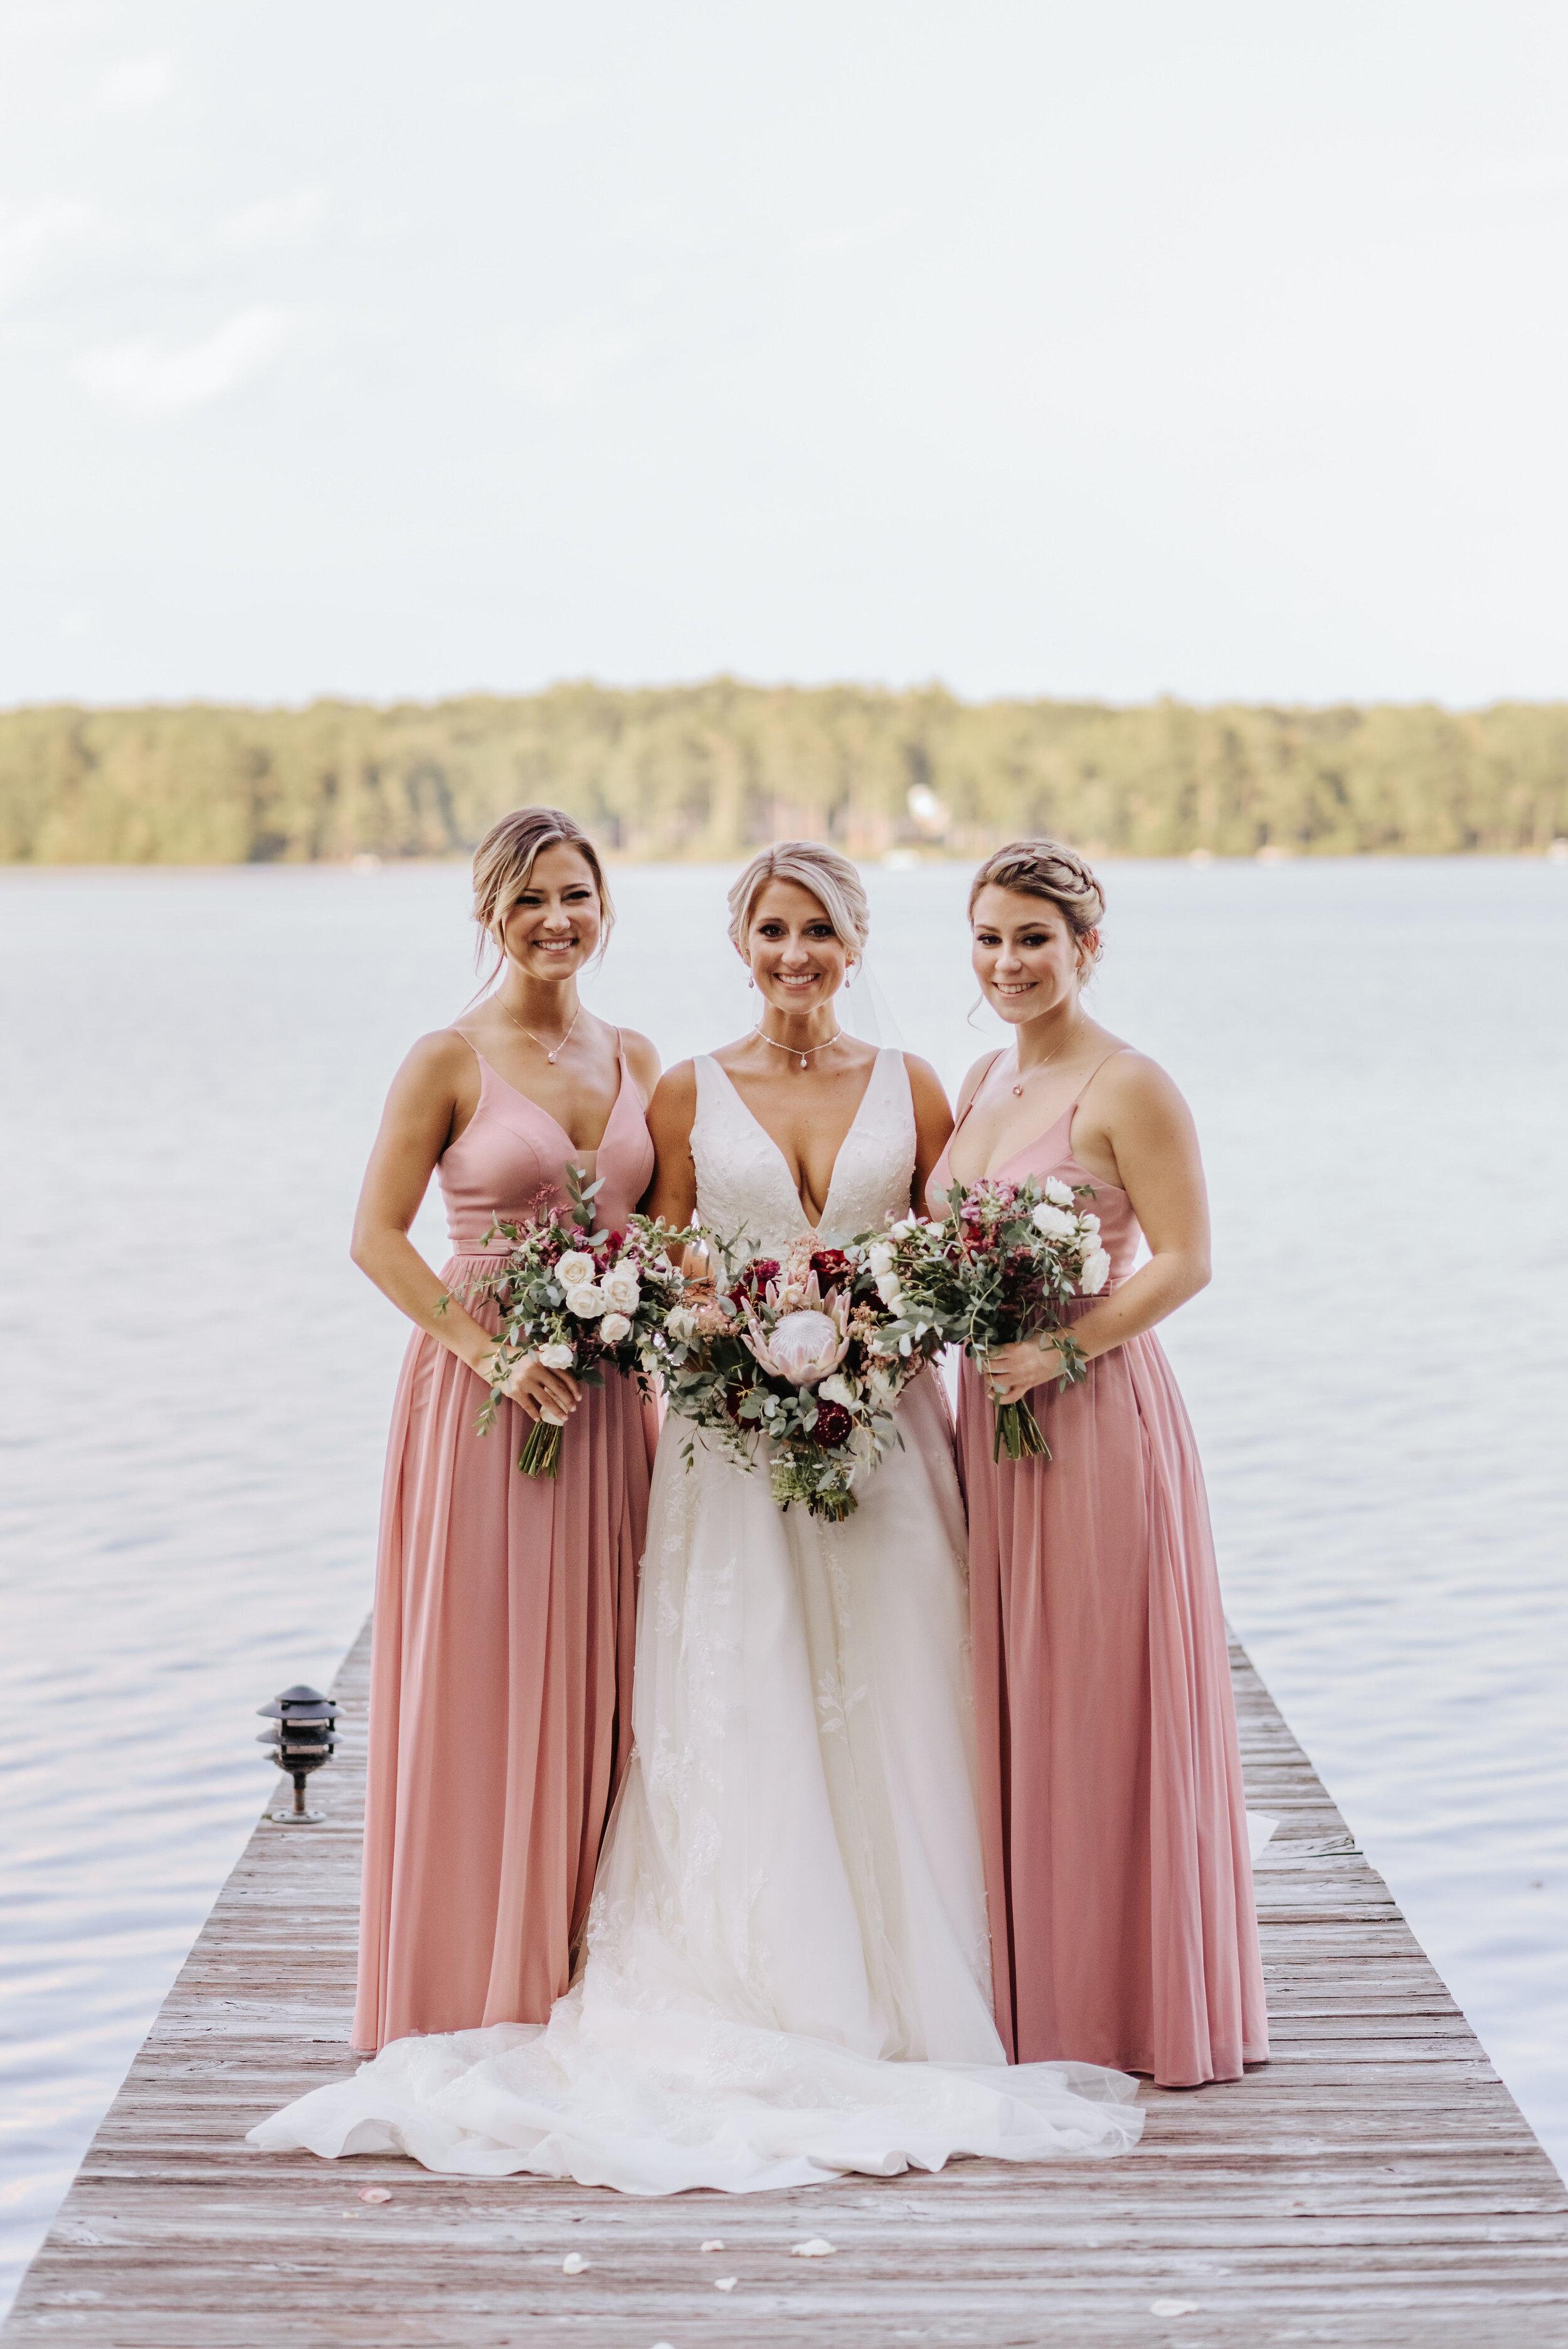 Emily_Mike_Wedding_Celebrations_at_the_Reservoir_Pool_Pavilion_Richmond_Virginia_Wedding_Photographer_Photography_by_V_68.jpg